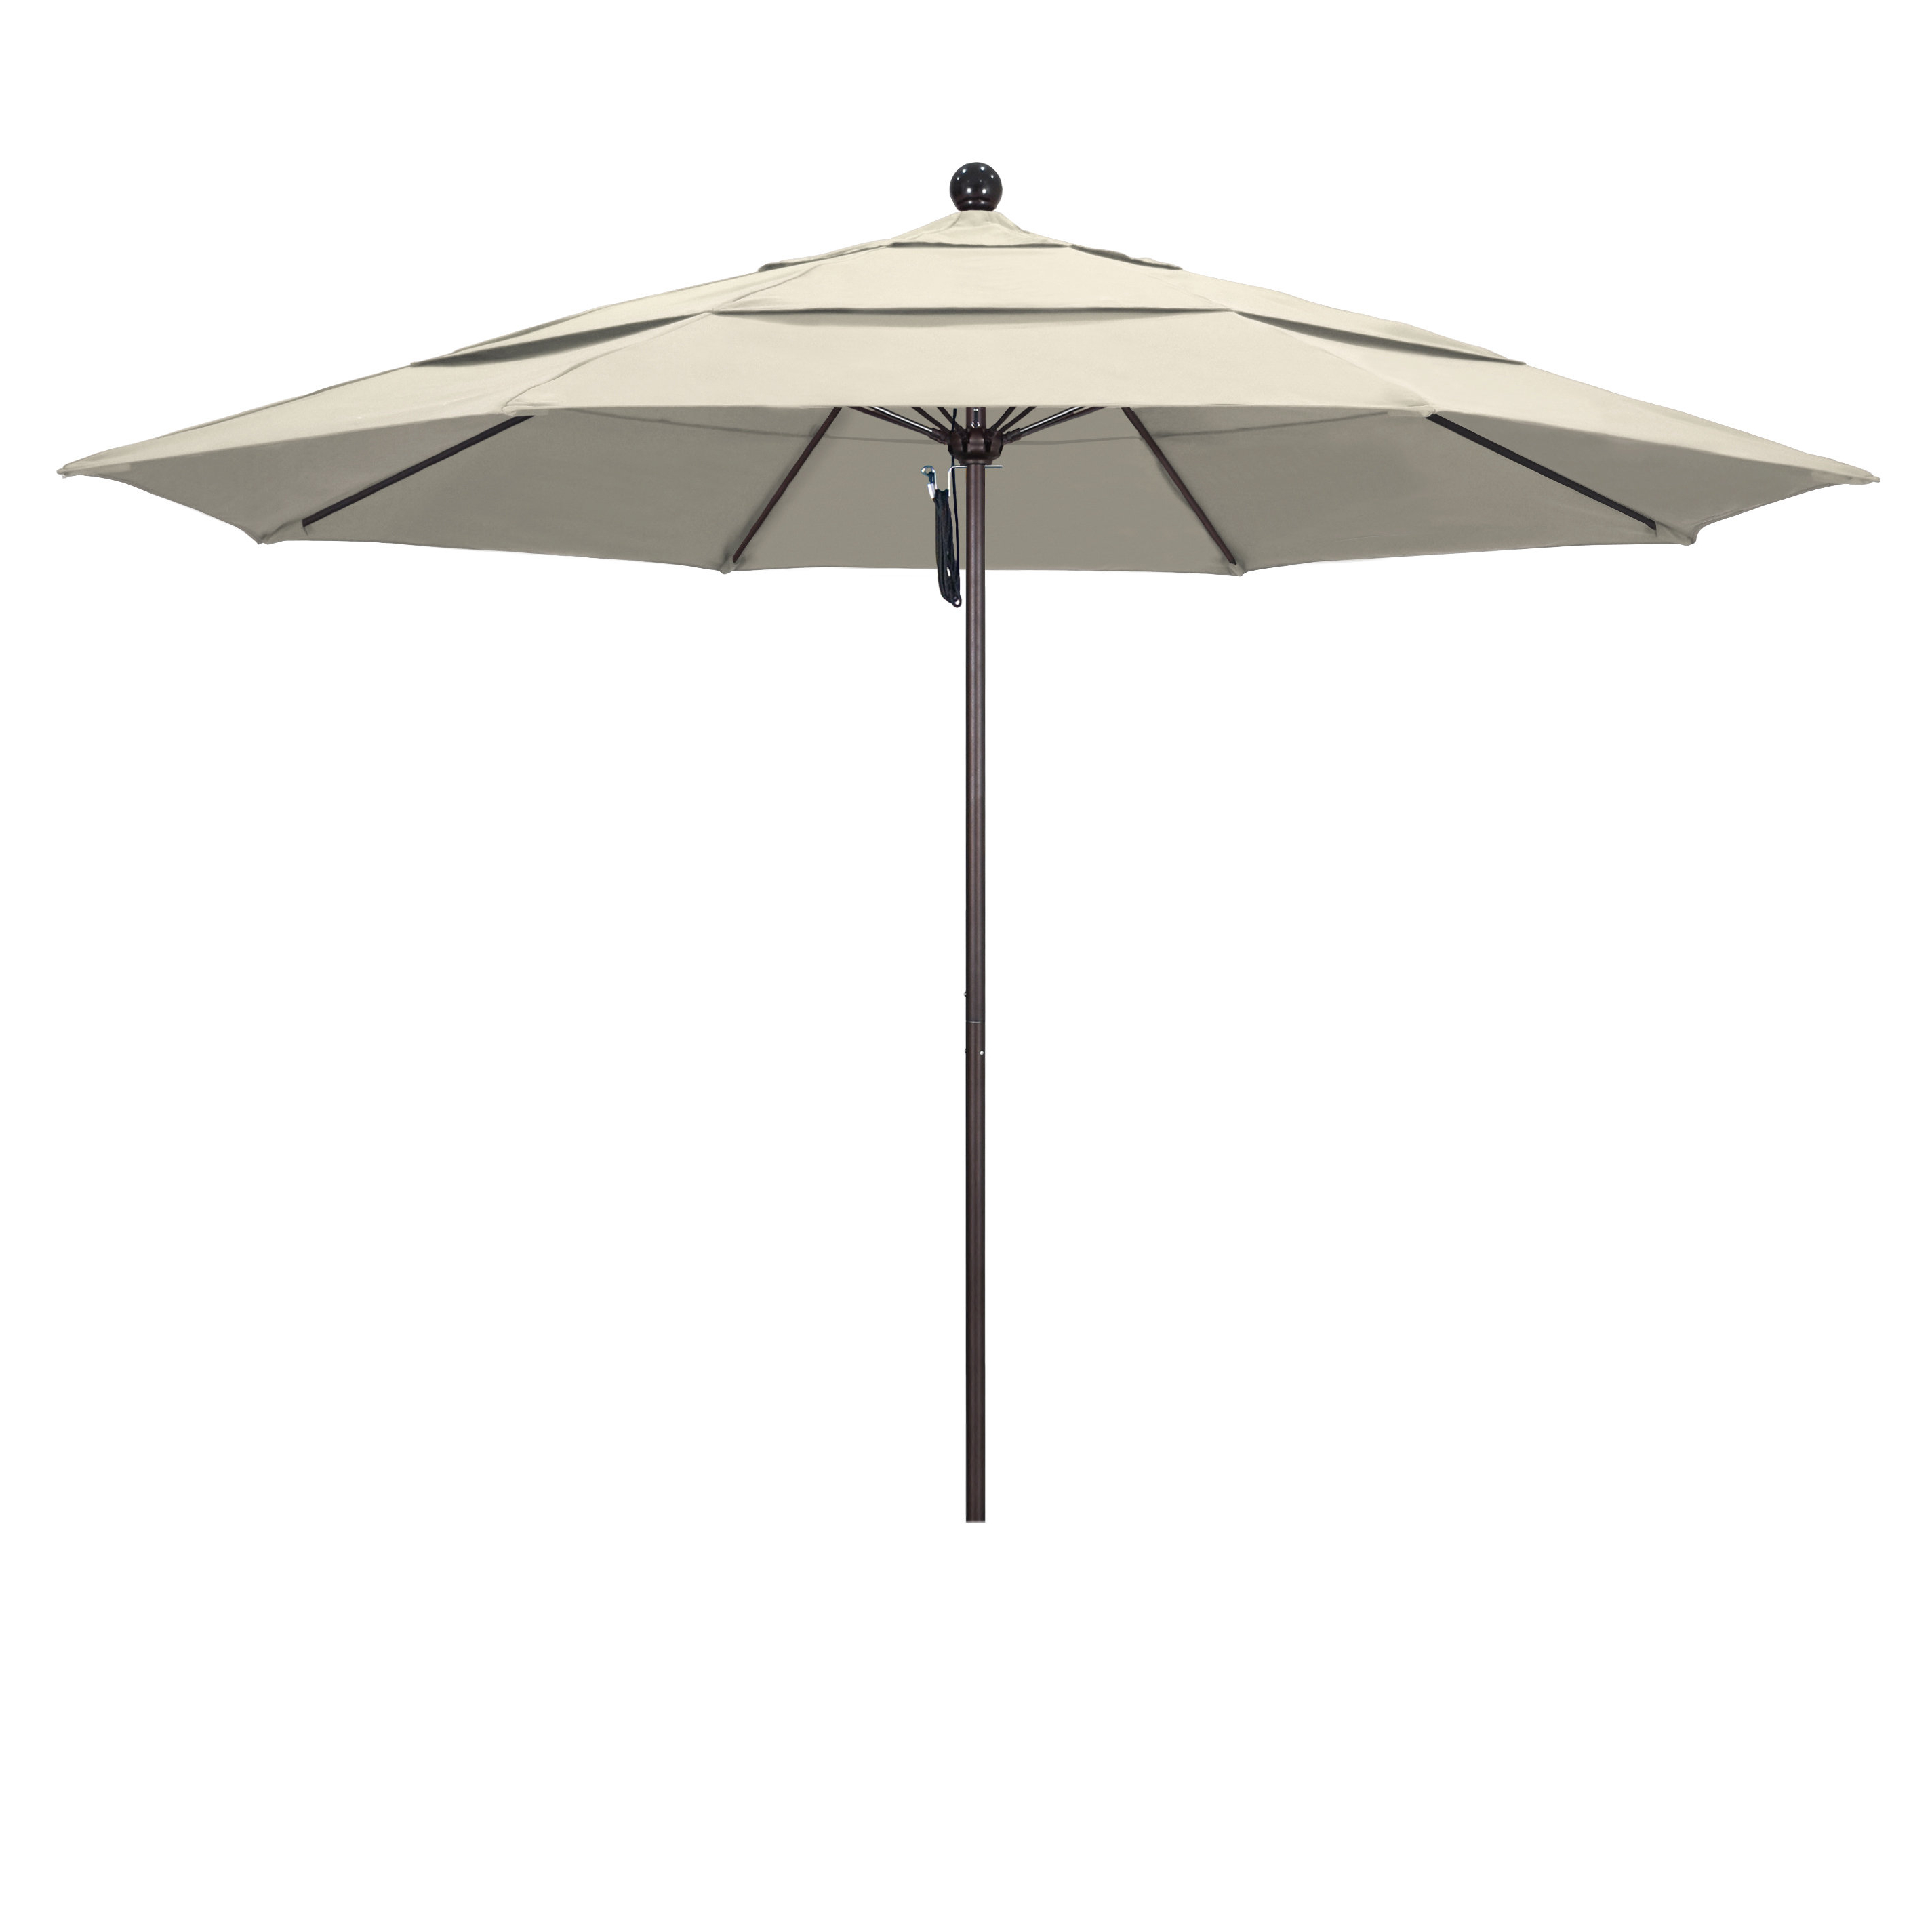 Duxbury 11' Market Umbrella With Fashionable Isom Market Umbrellas (View 4 of 20)